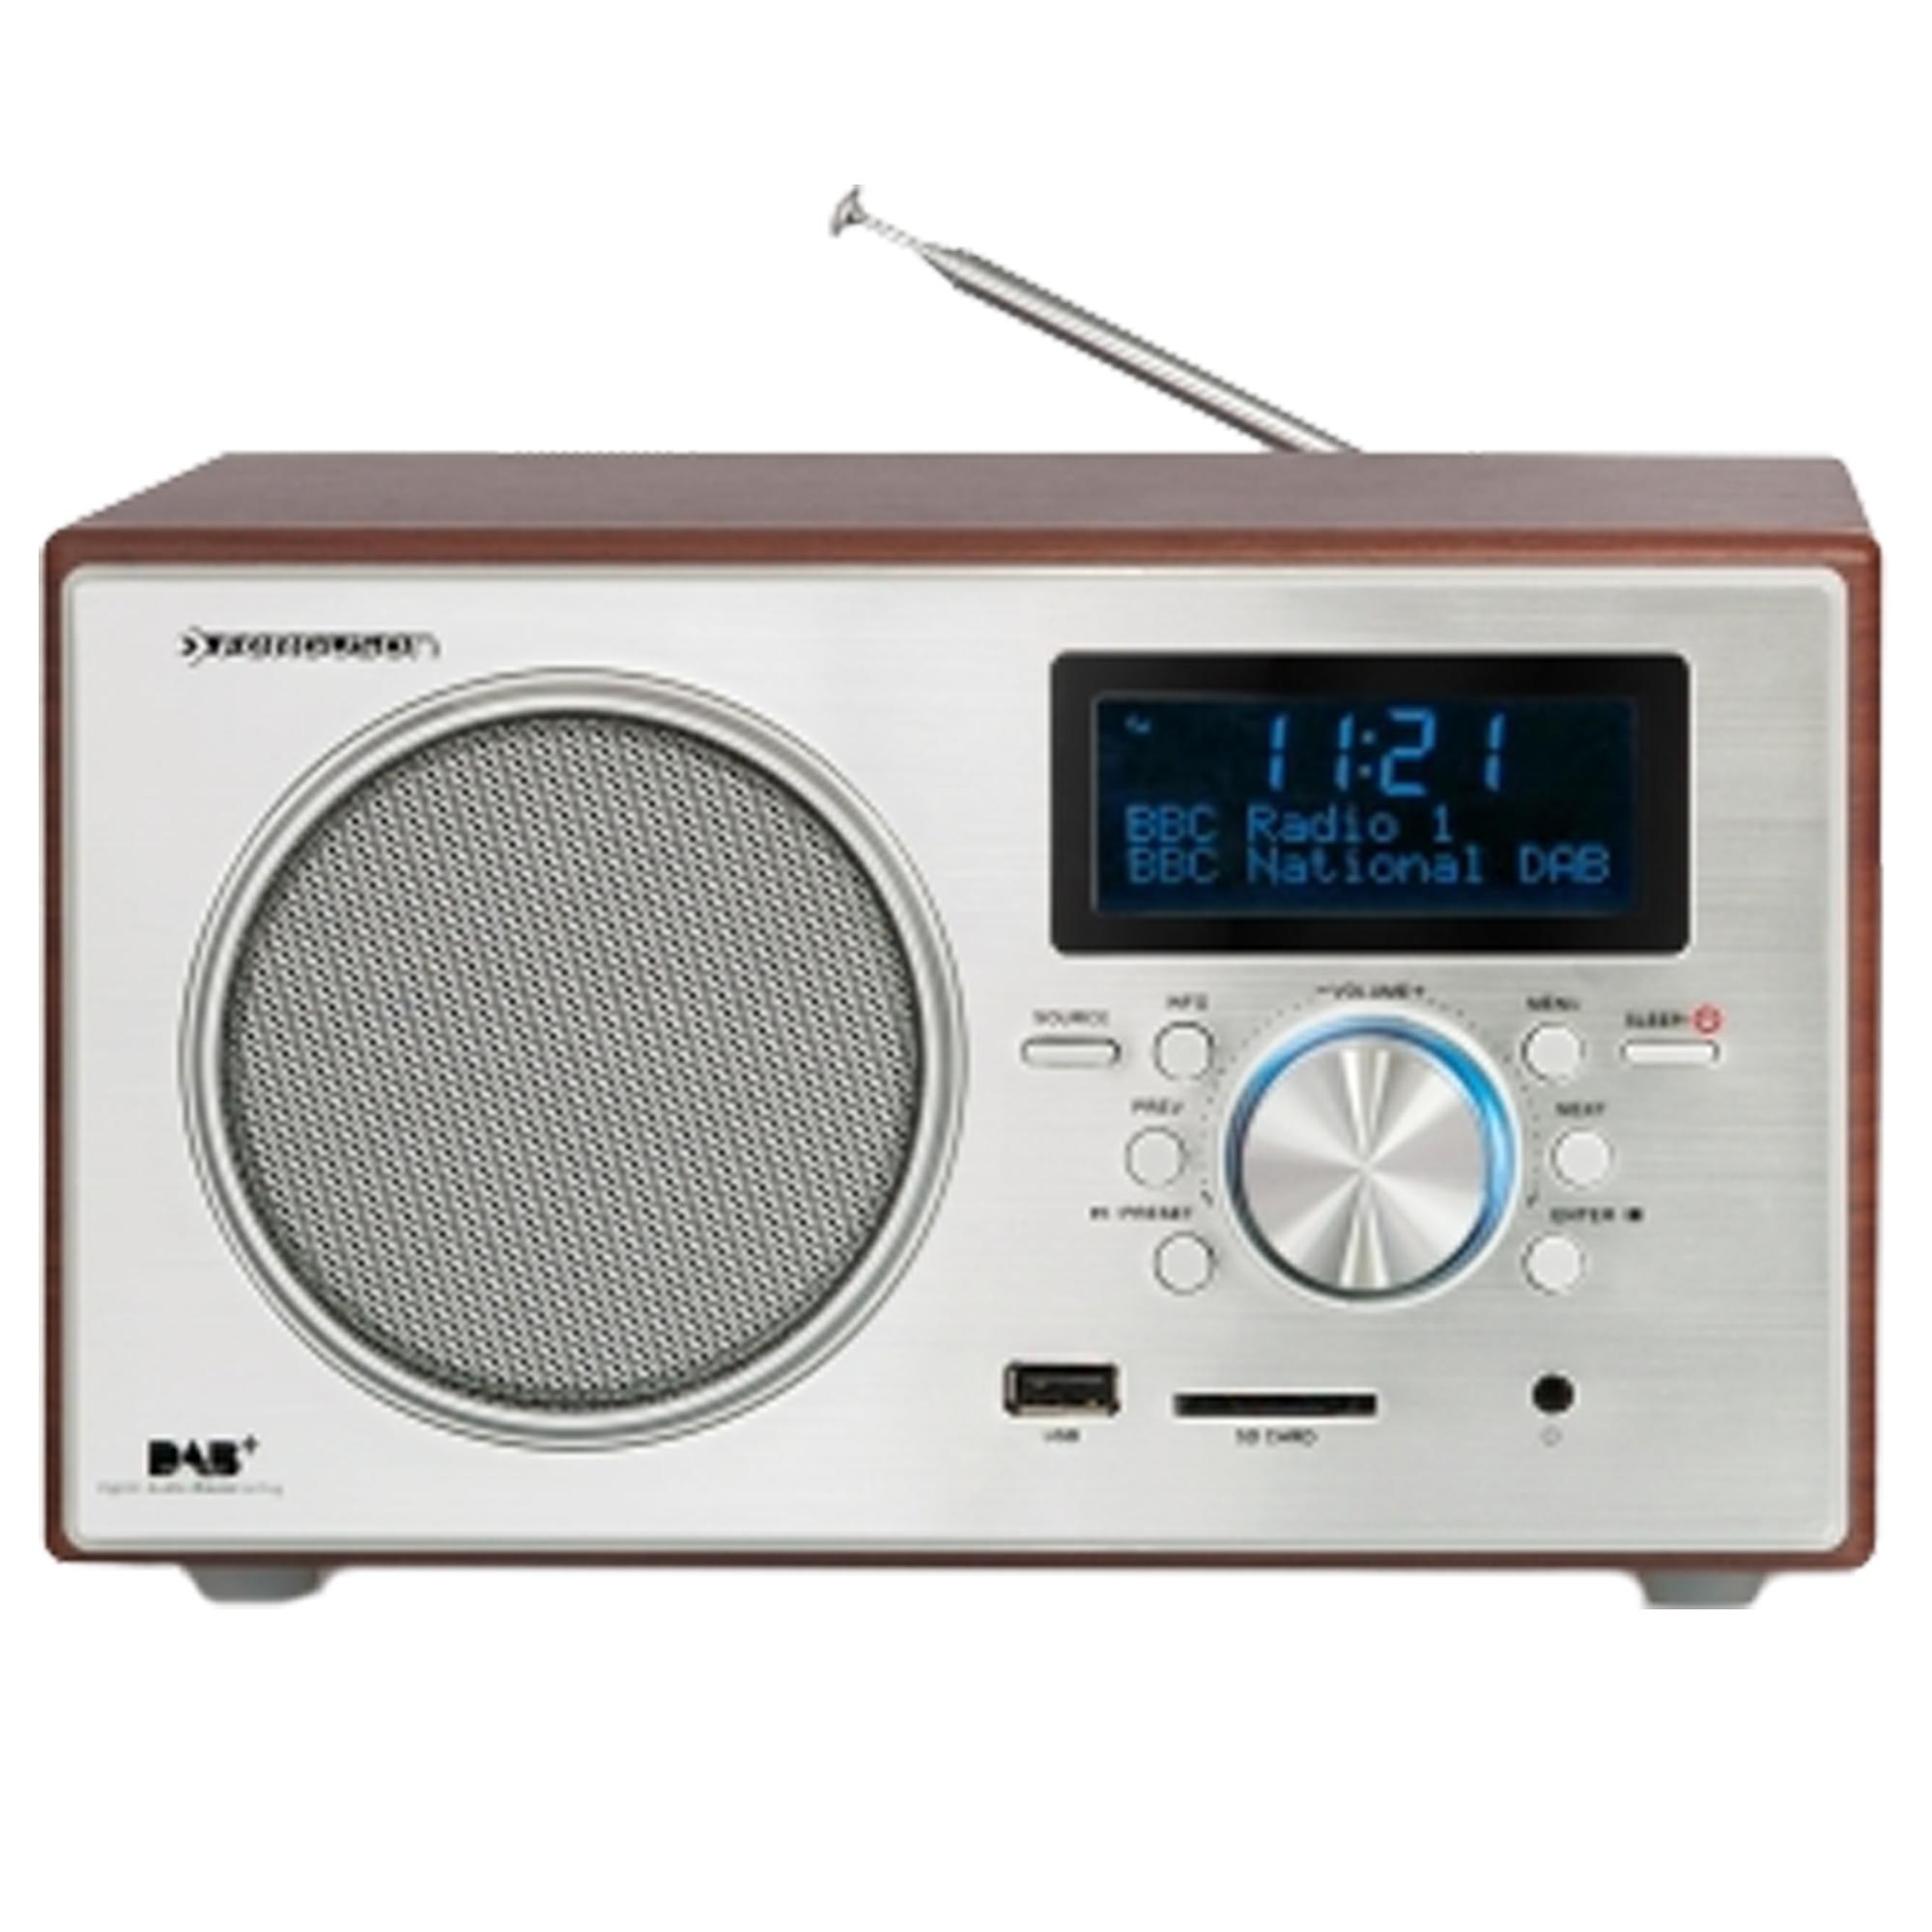 ferguson digital dab 150 dab ukw radio mit usb sd. Black Bedroom Furniture Sets. Home Design Ideas